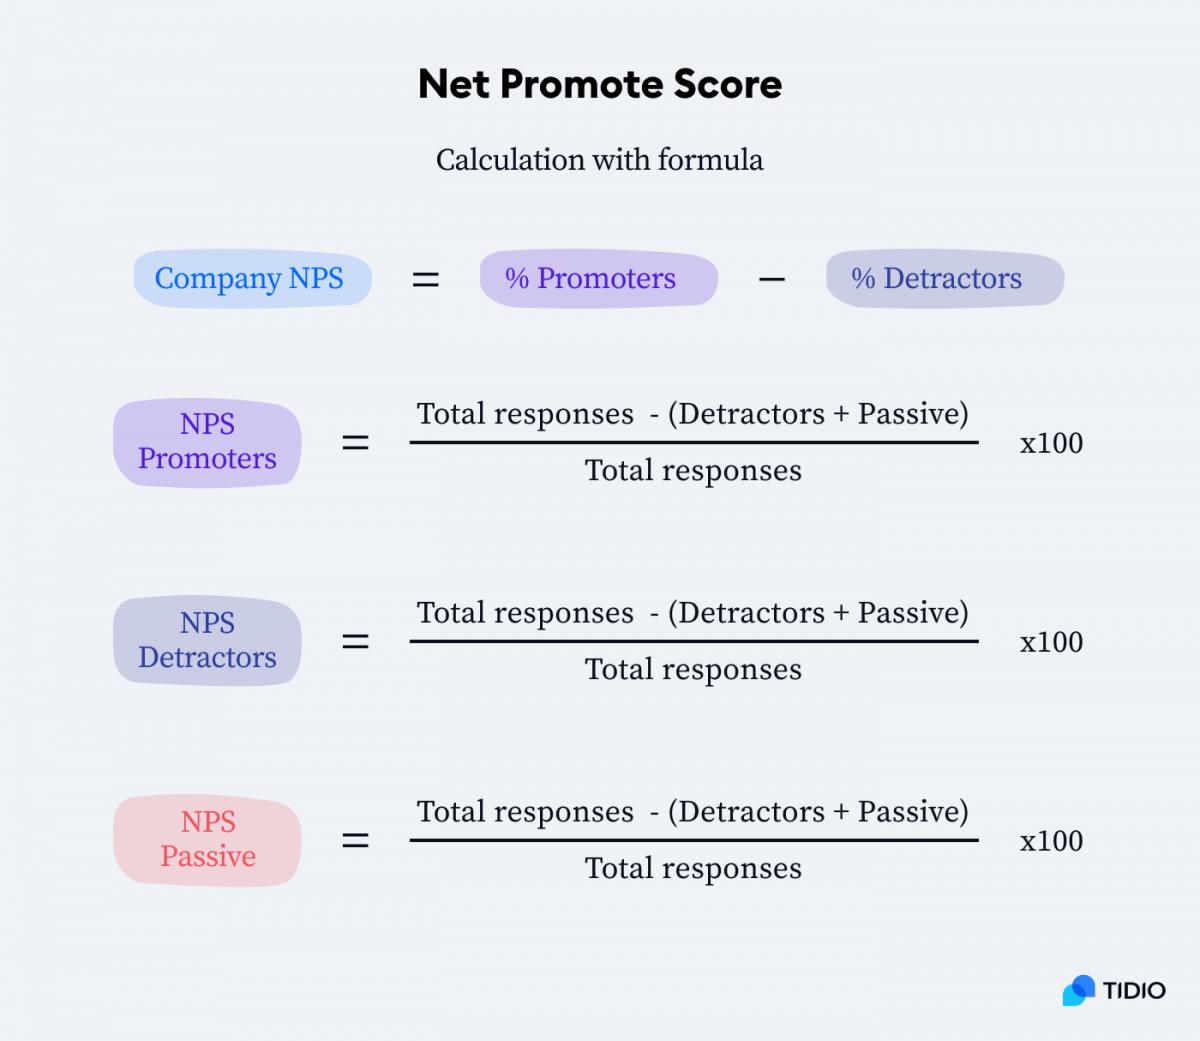 Net Promote Score calculation with formula